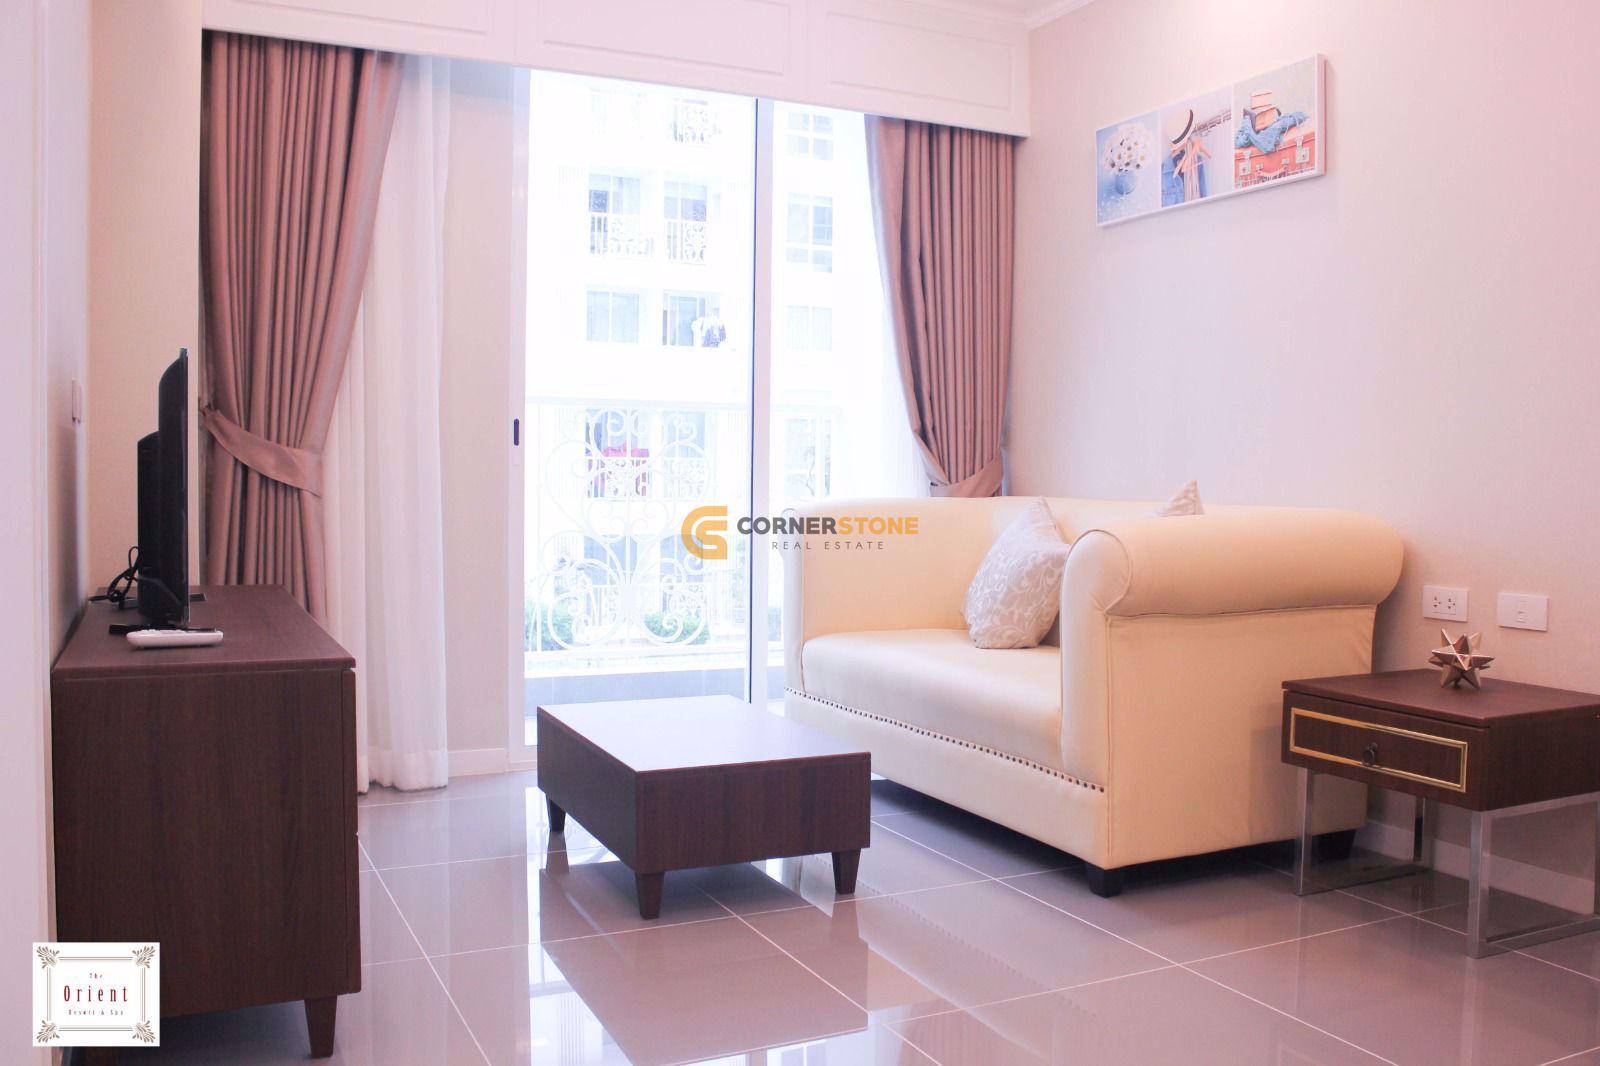 1 bed Condo in The Orient Resort and Spa in Jomtien C002362